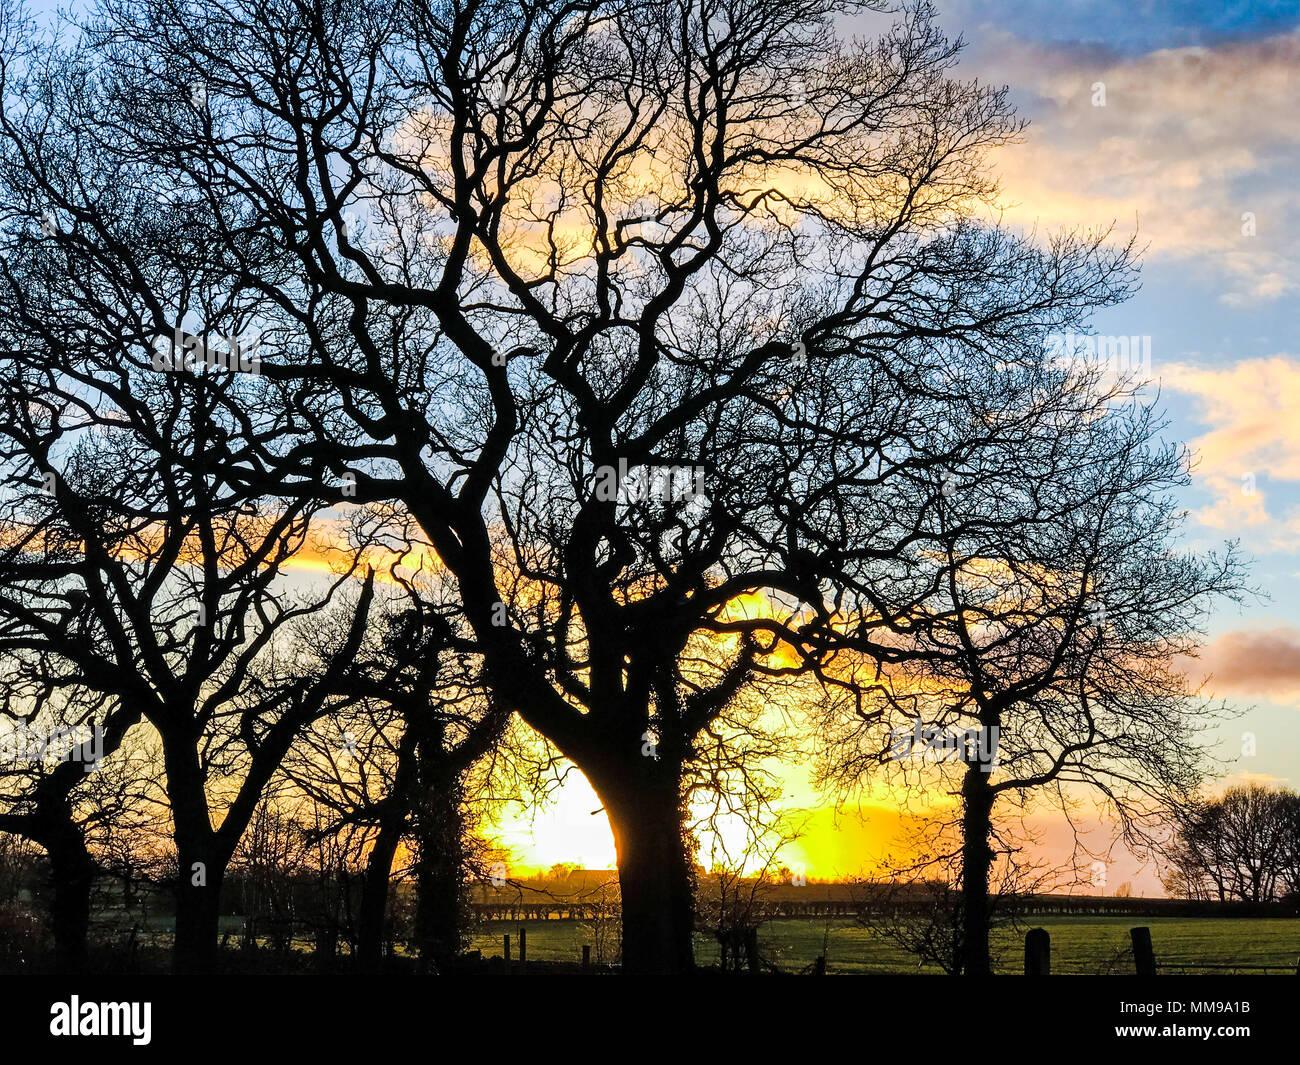 Dramatic Sunset behind trees in winter, Cheshire, England, UK - Stock Image